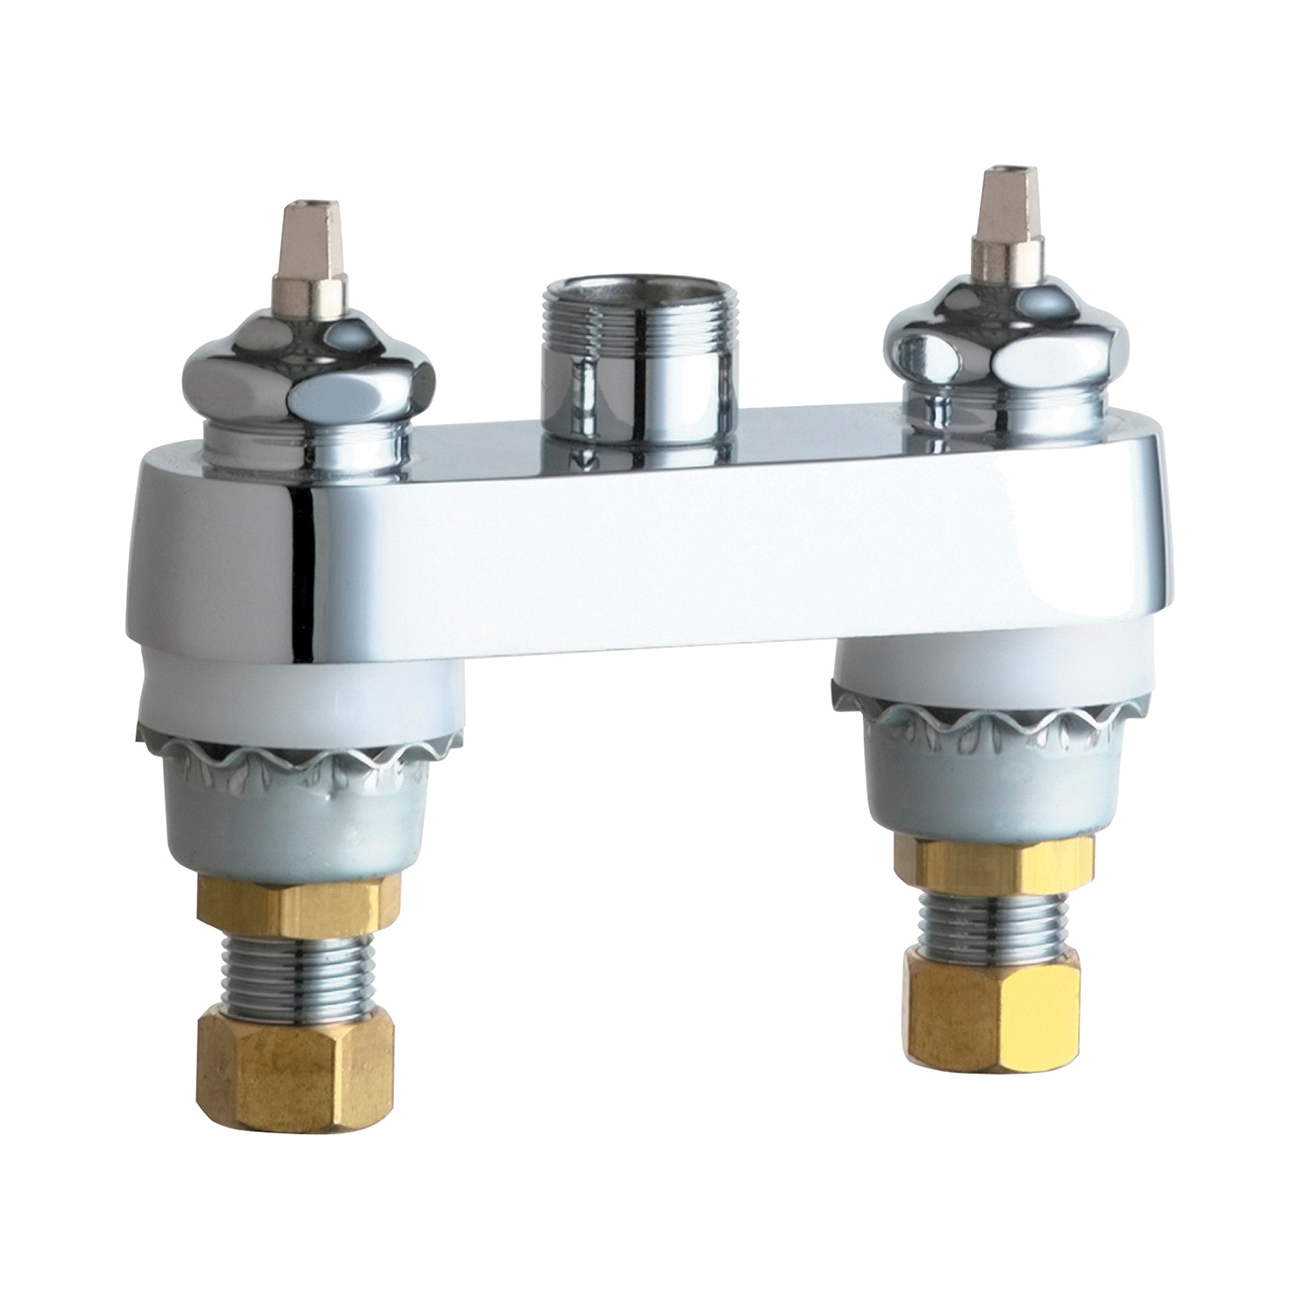 Chicago Faucet® 895-LESHAB Lavatory Sink Faucet, Chrome Plated